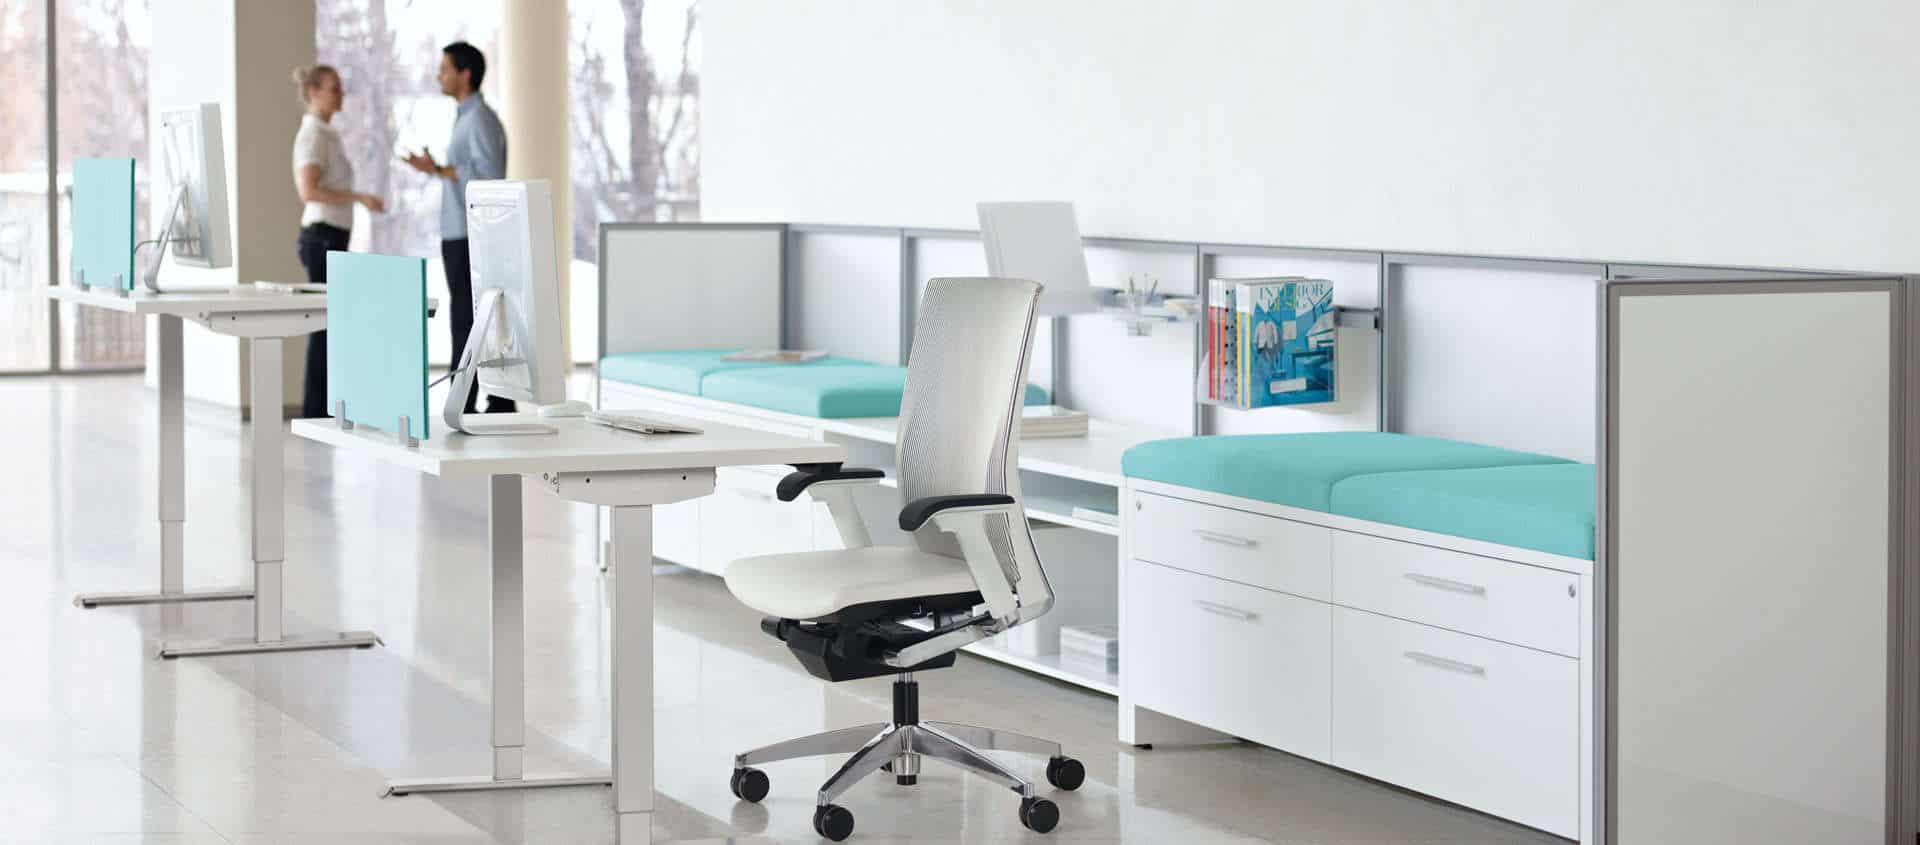 office telecommuting Via Global